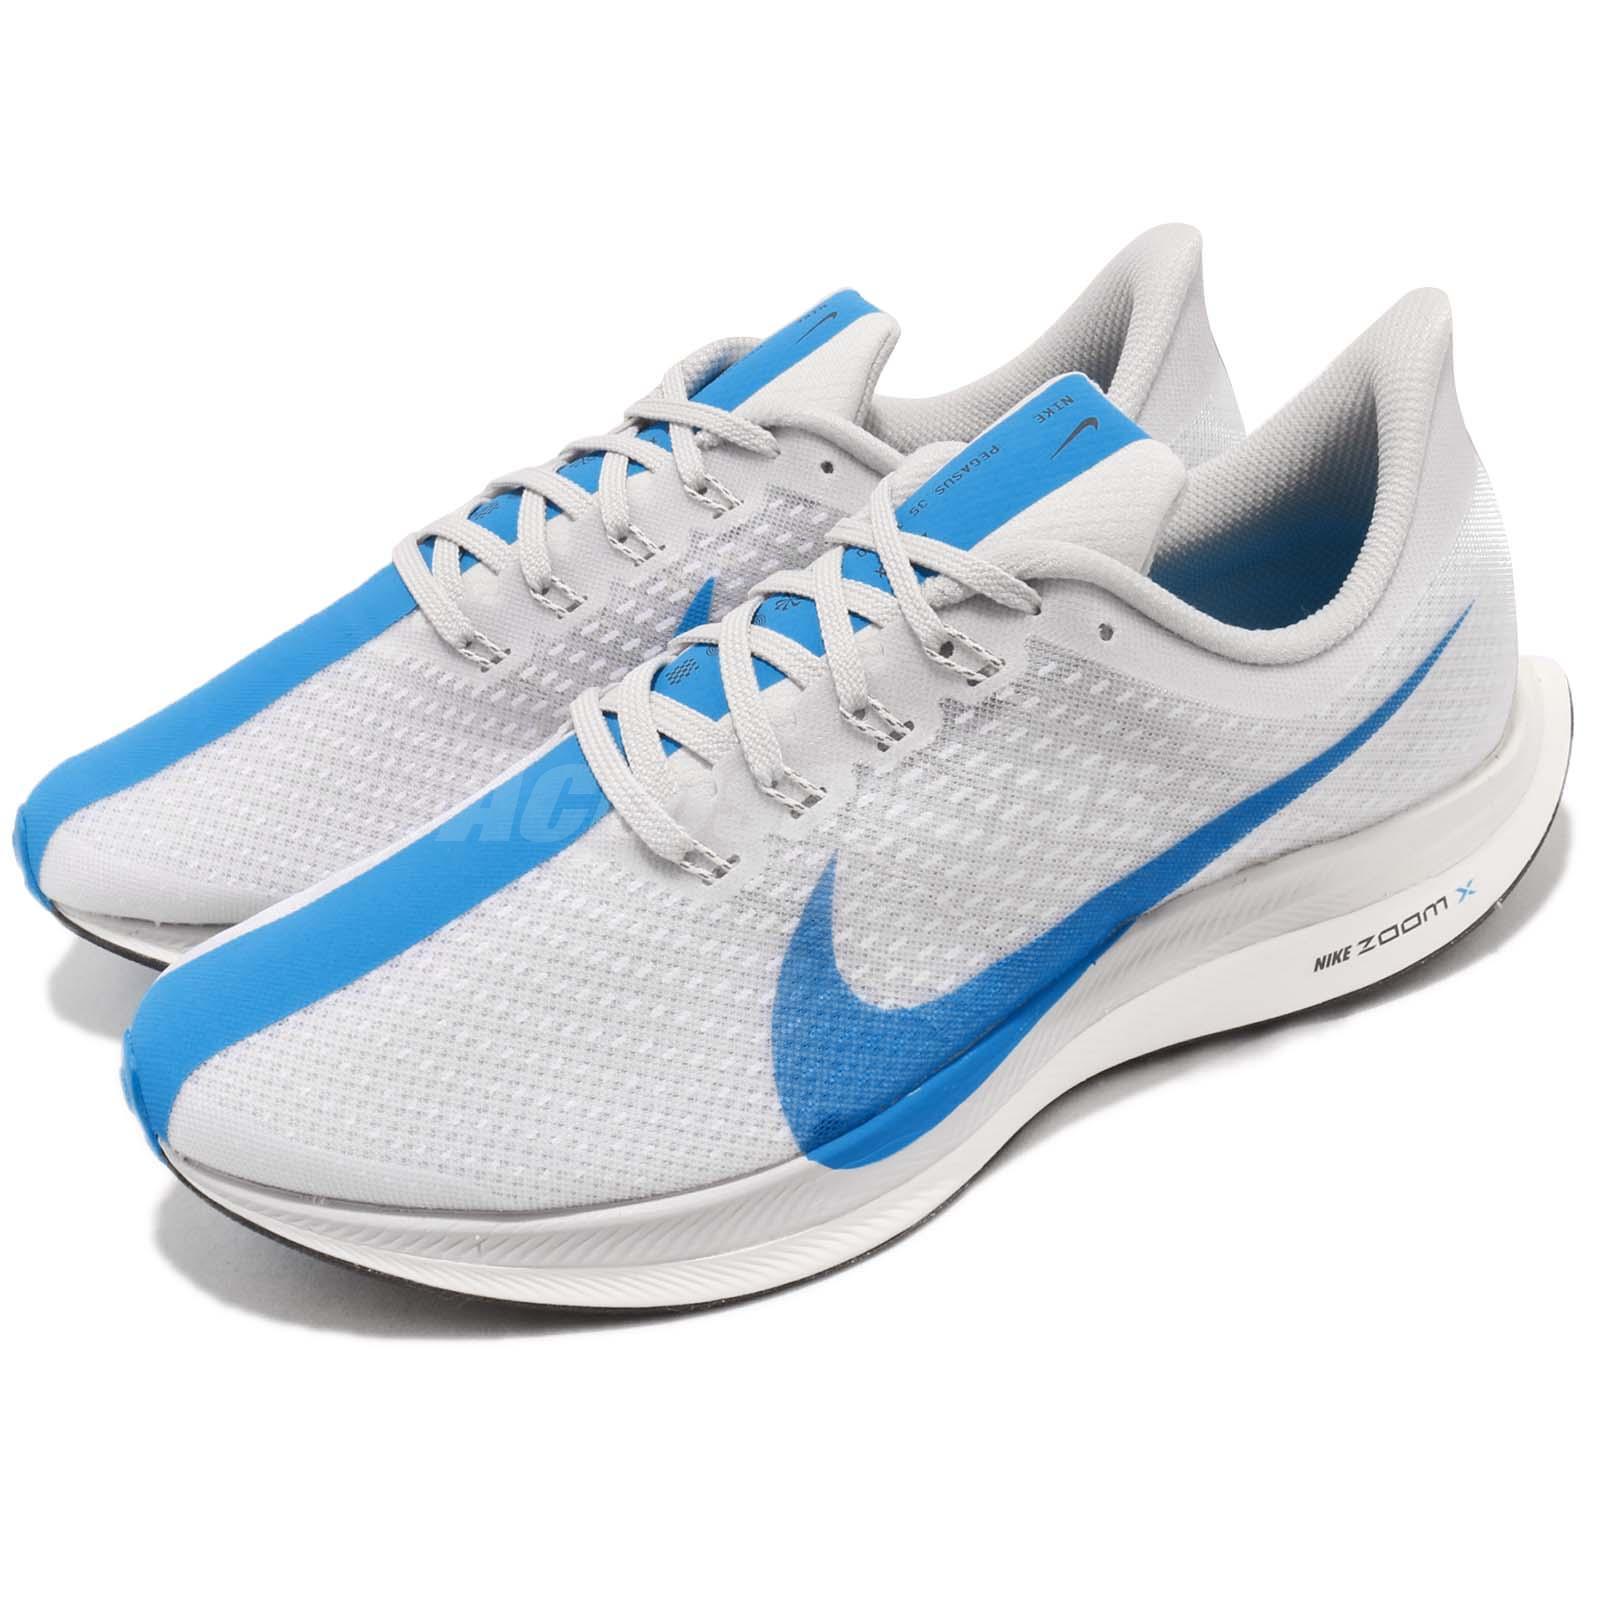 e0256597bc4 Details about Nike Zoom Pegasus 35 Turbo White Blue Hero Grey Mens Running  Shoes AJ4114-140